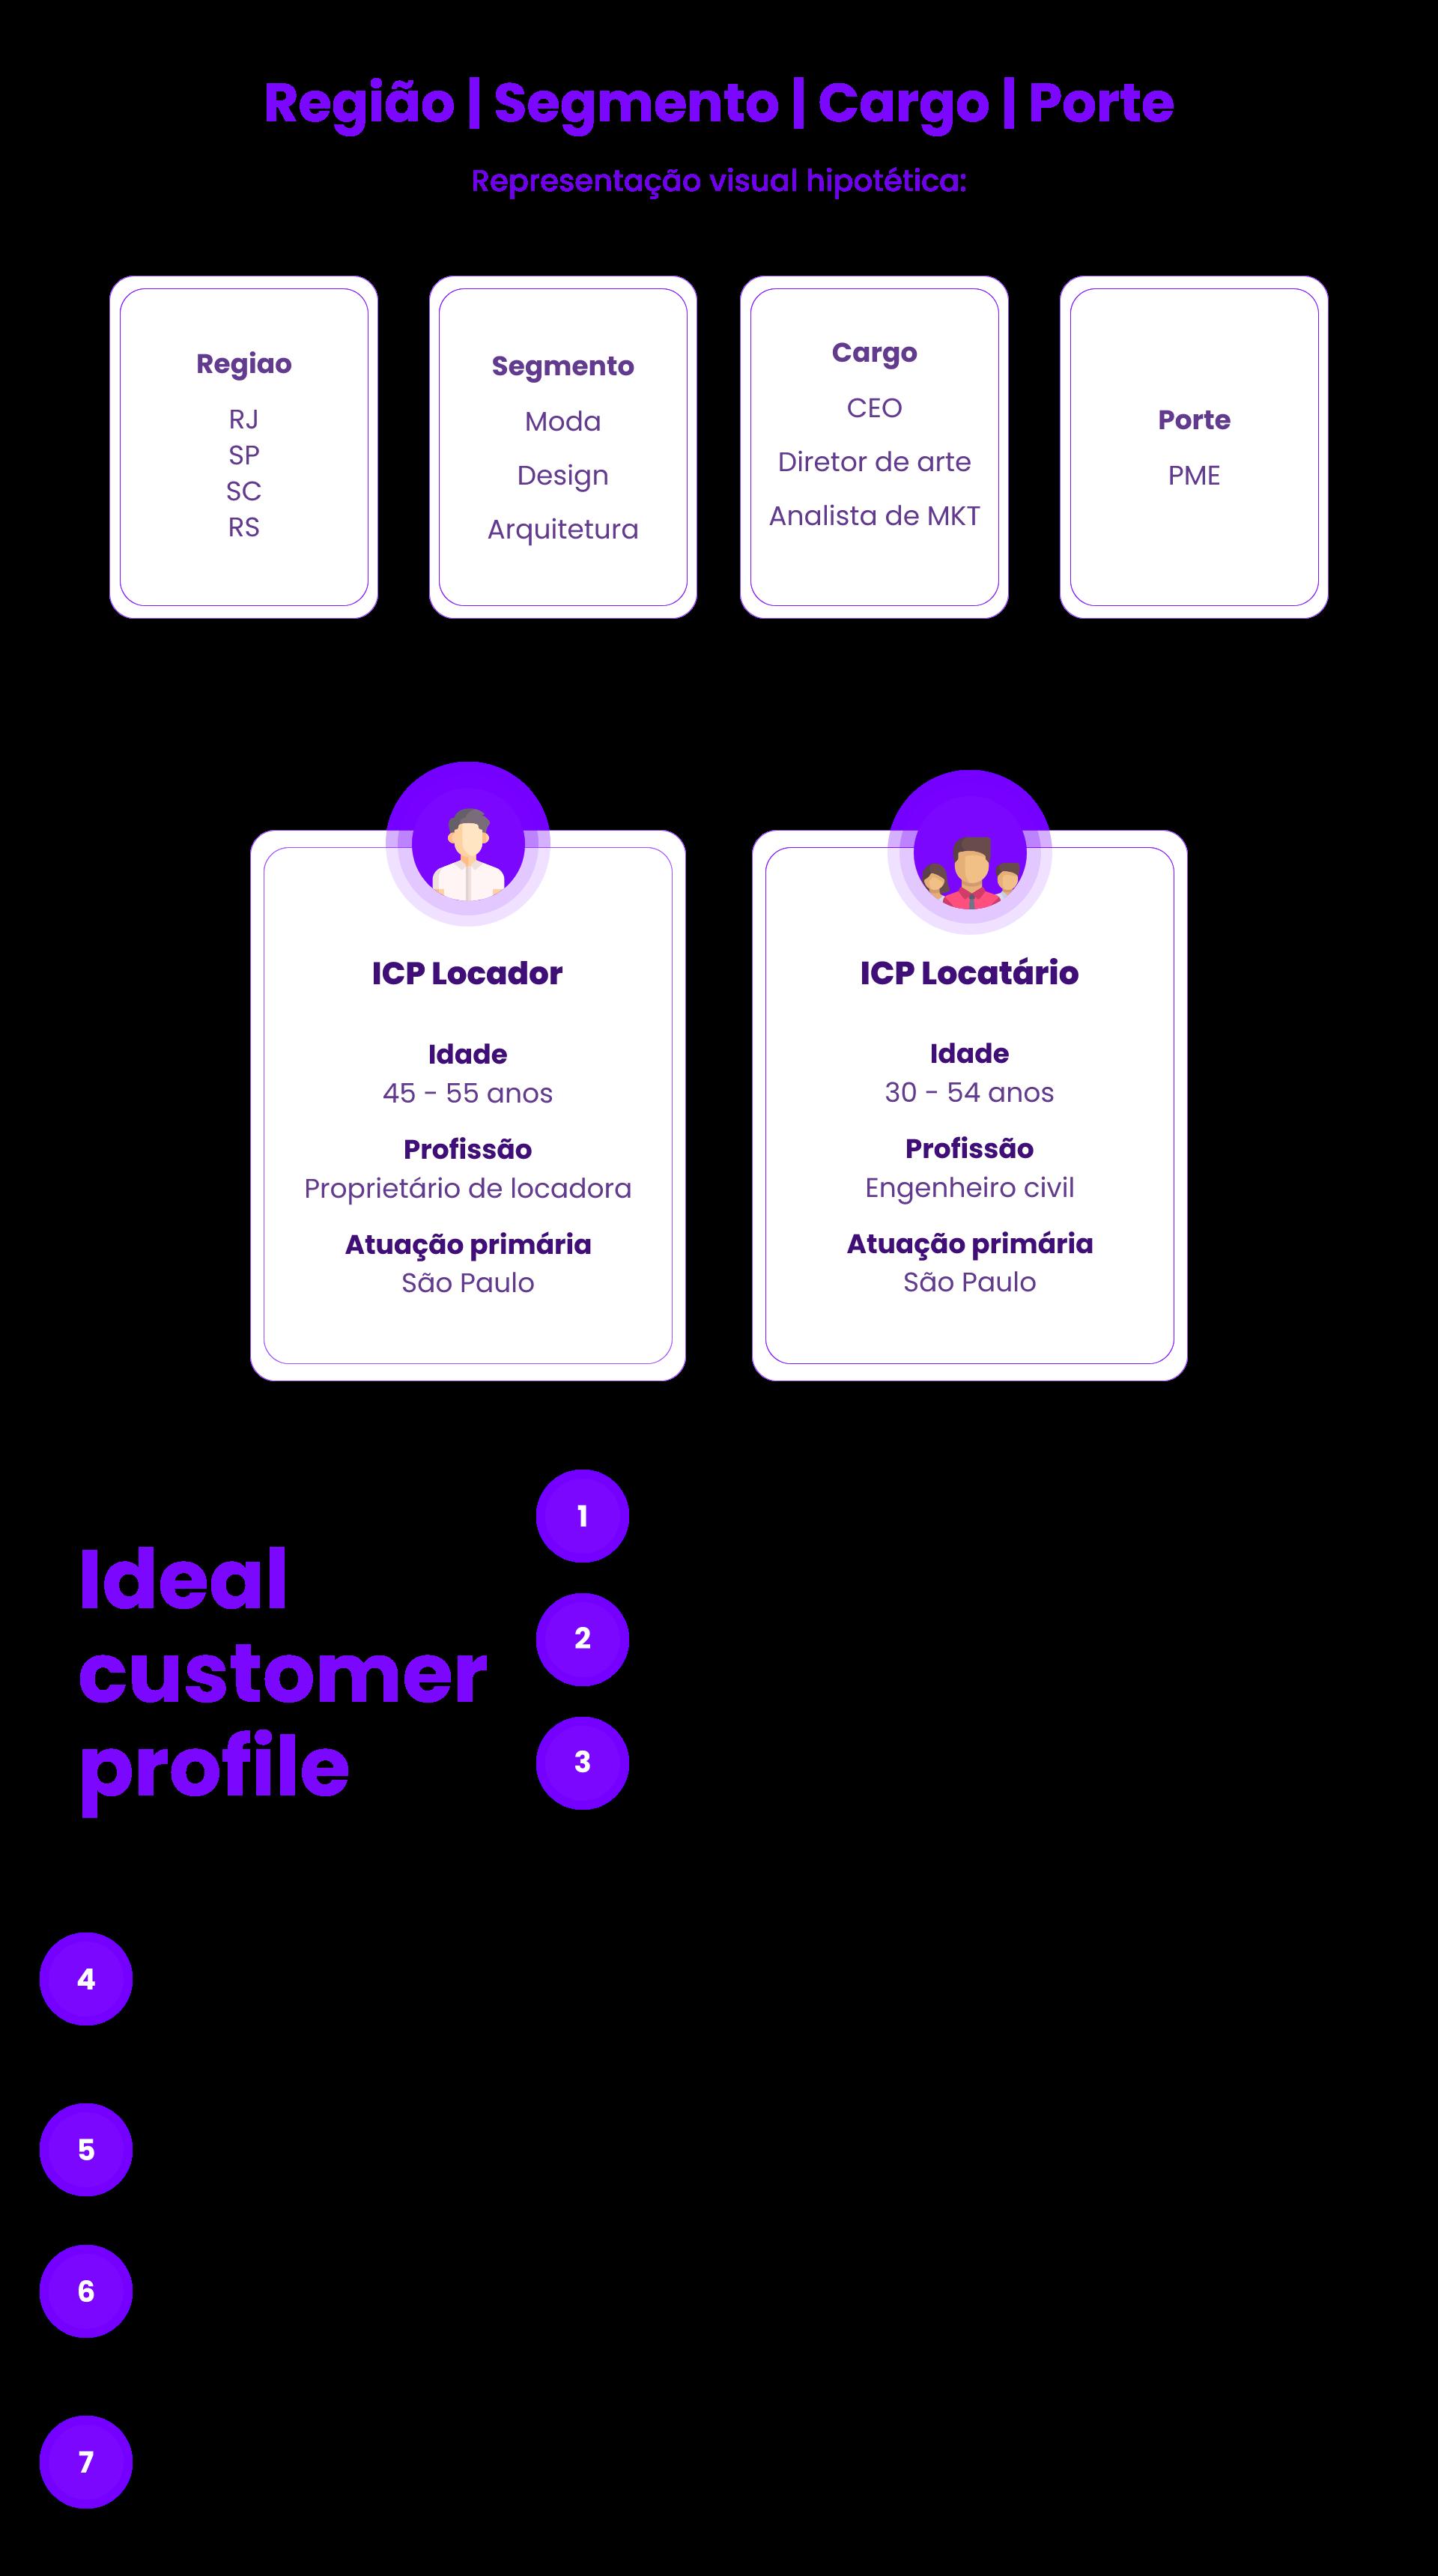 infografico_ideal_customer_profile